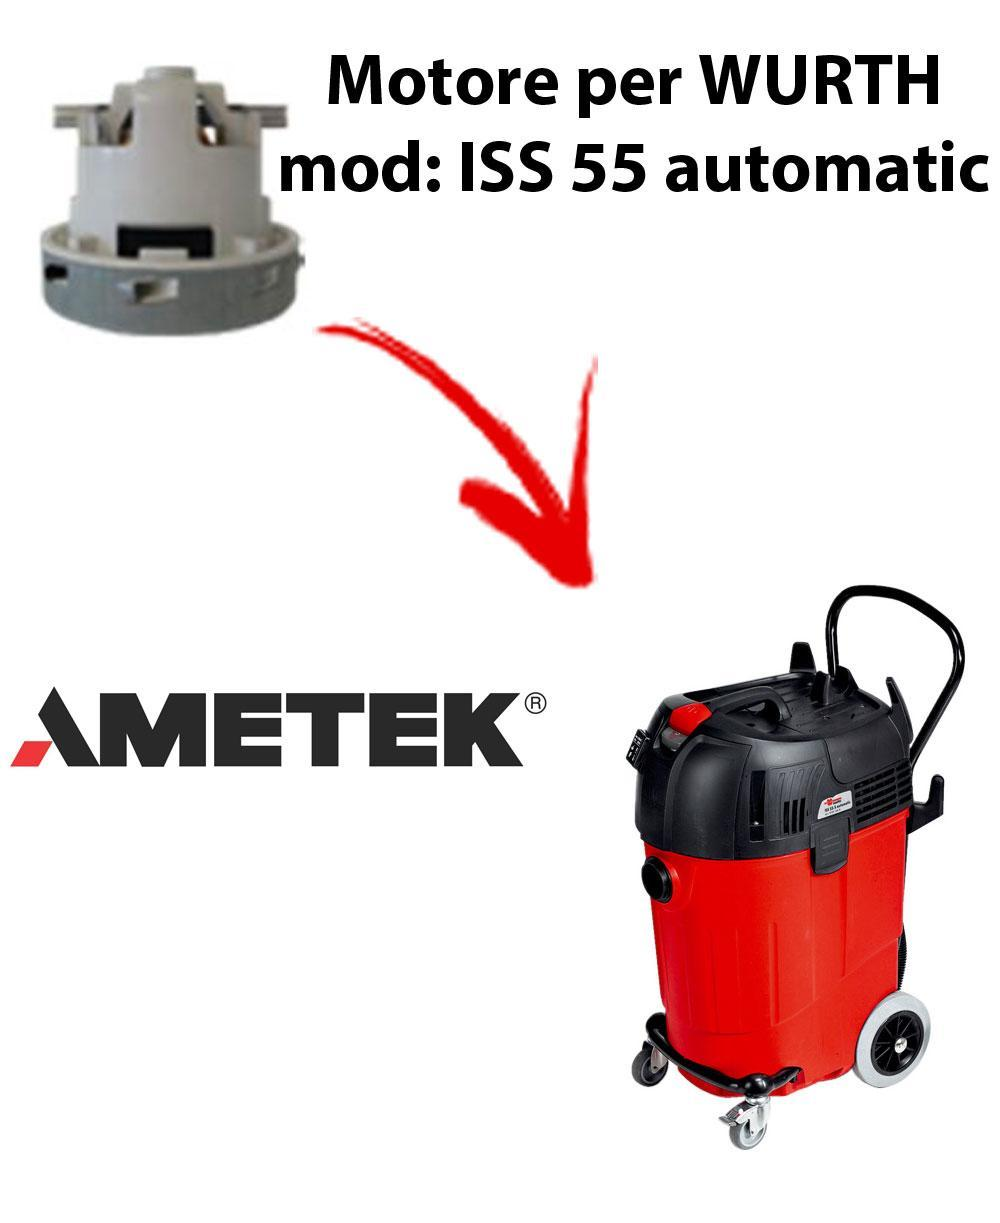 ISS 55 automatic Ametek Vacuum Motor for Vacuum cleaner WURTH